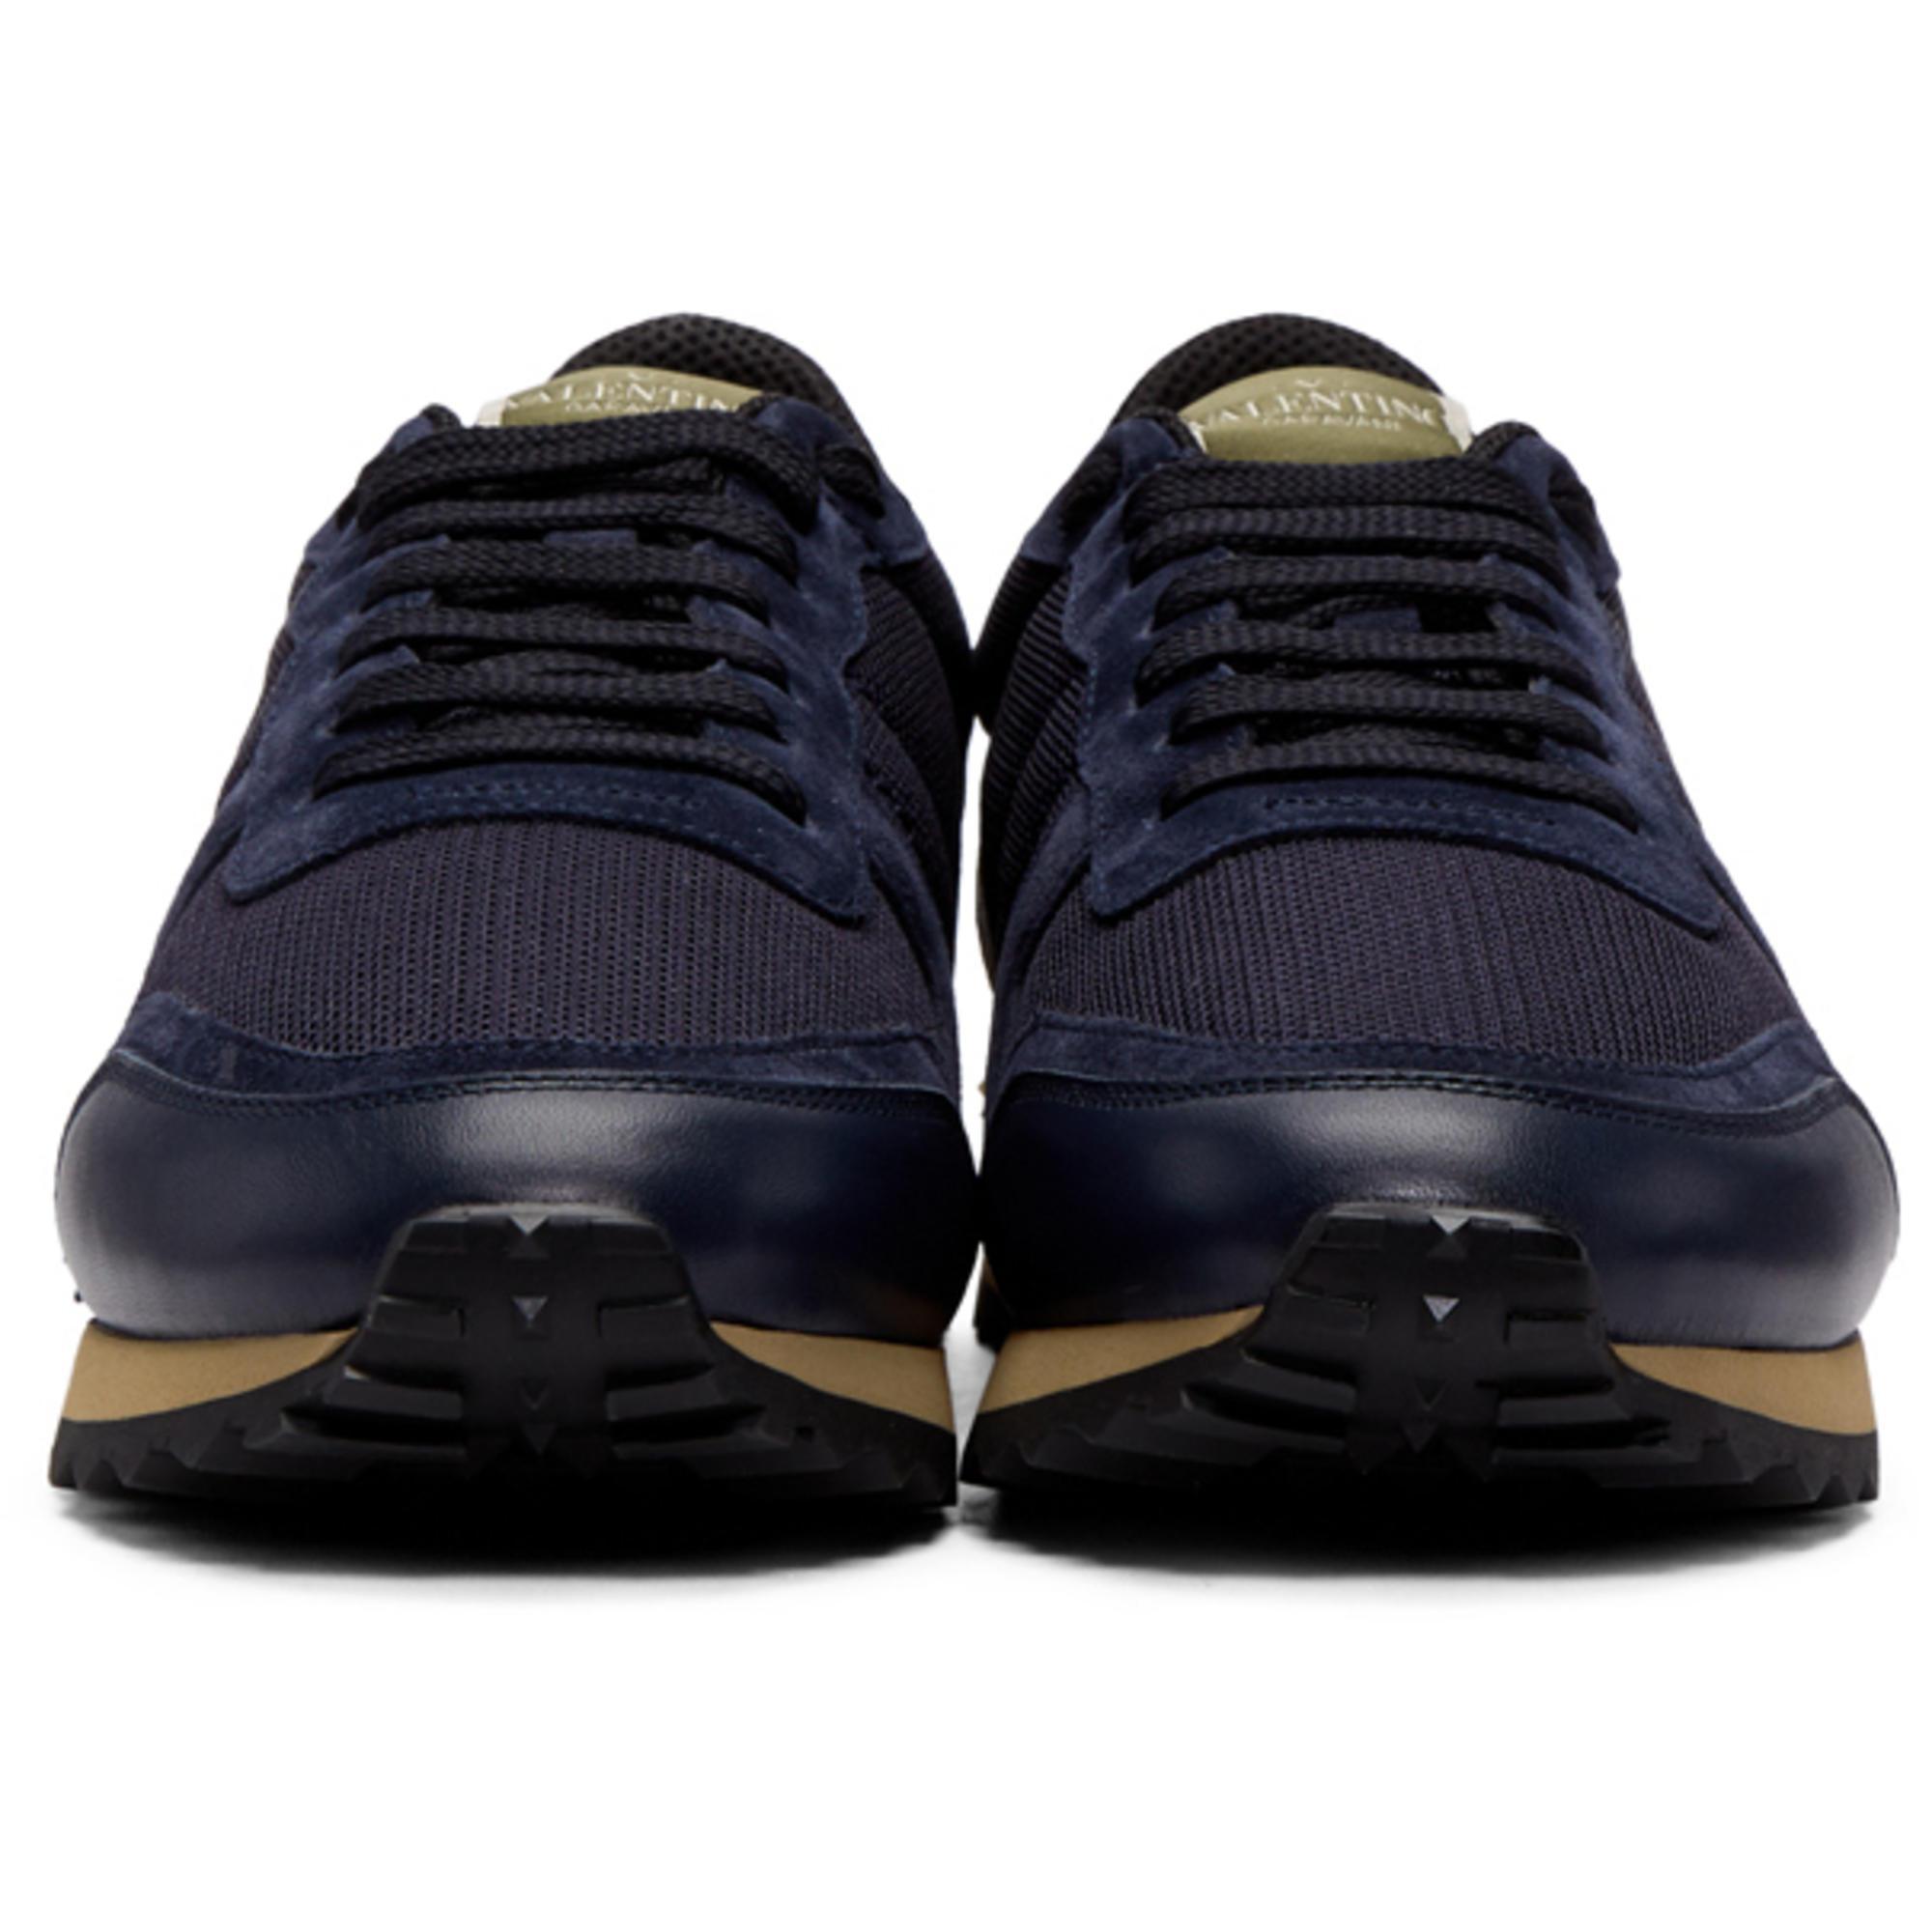 ab6045f0de9 Lyst - Valentino Navy Garavani Mesh Rockrunner Sneakers in Blue for Men